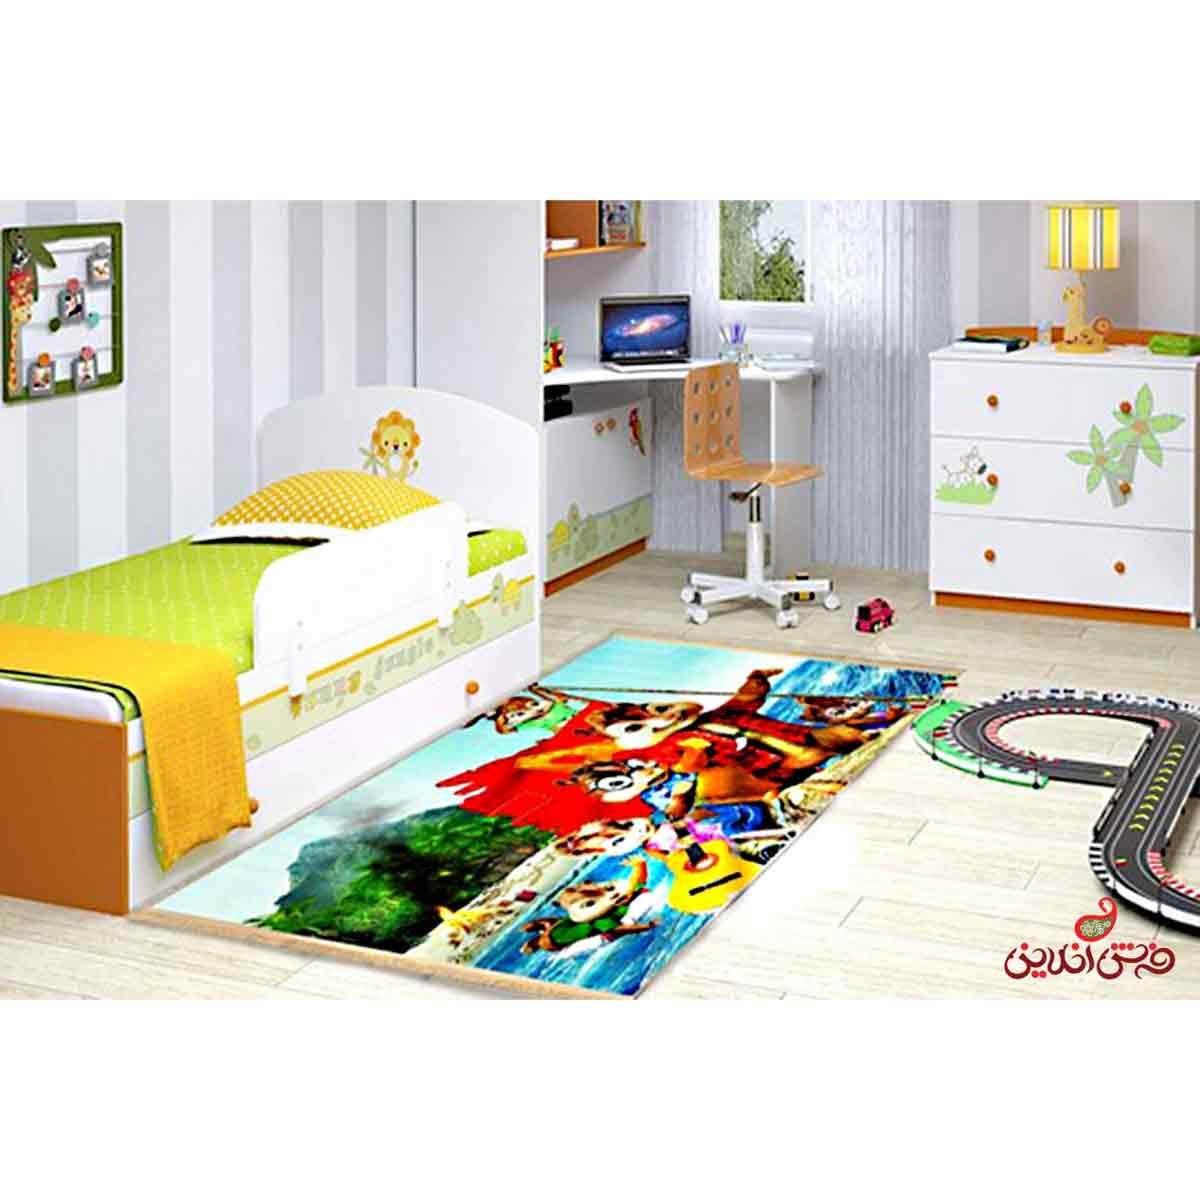 فرش ماشینی کودک کلاریس طرح آلوین و سنجاب ها کد 100201